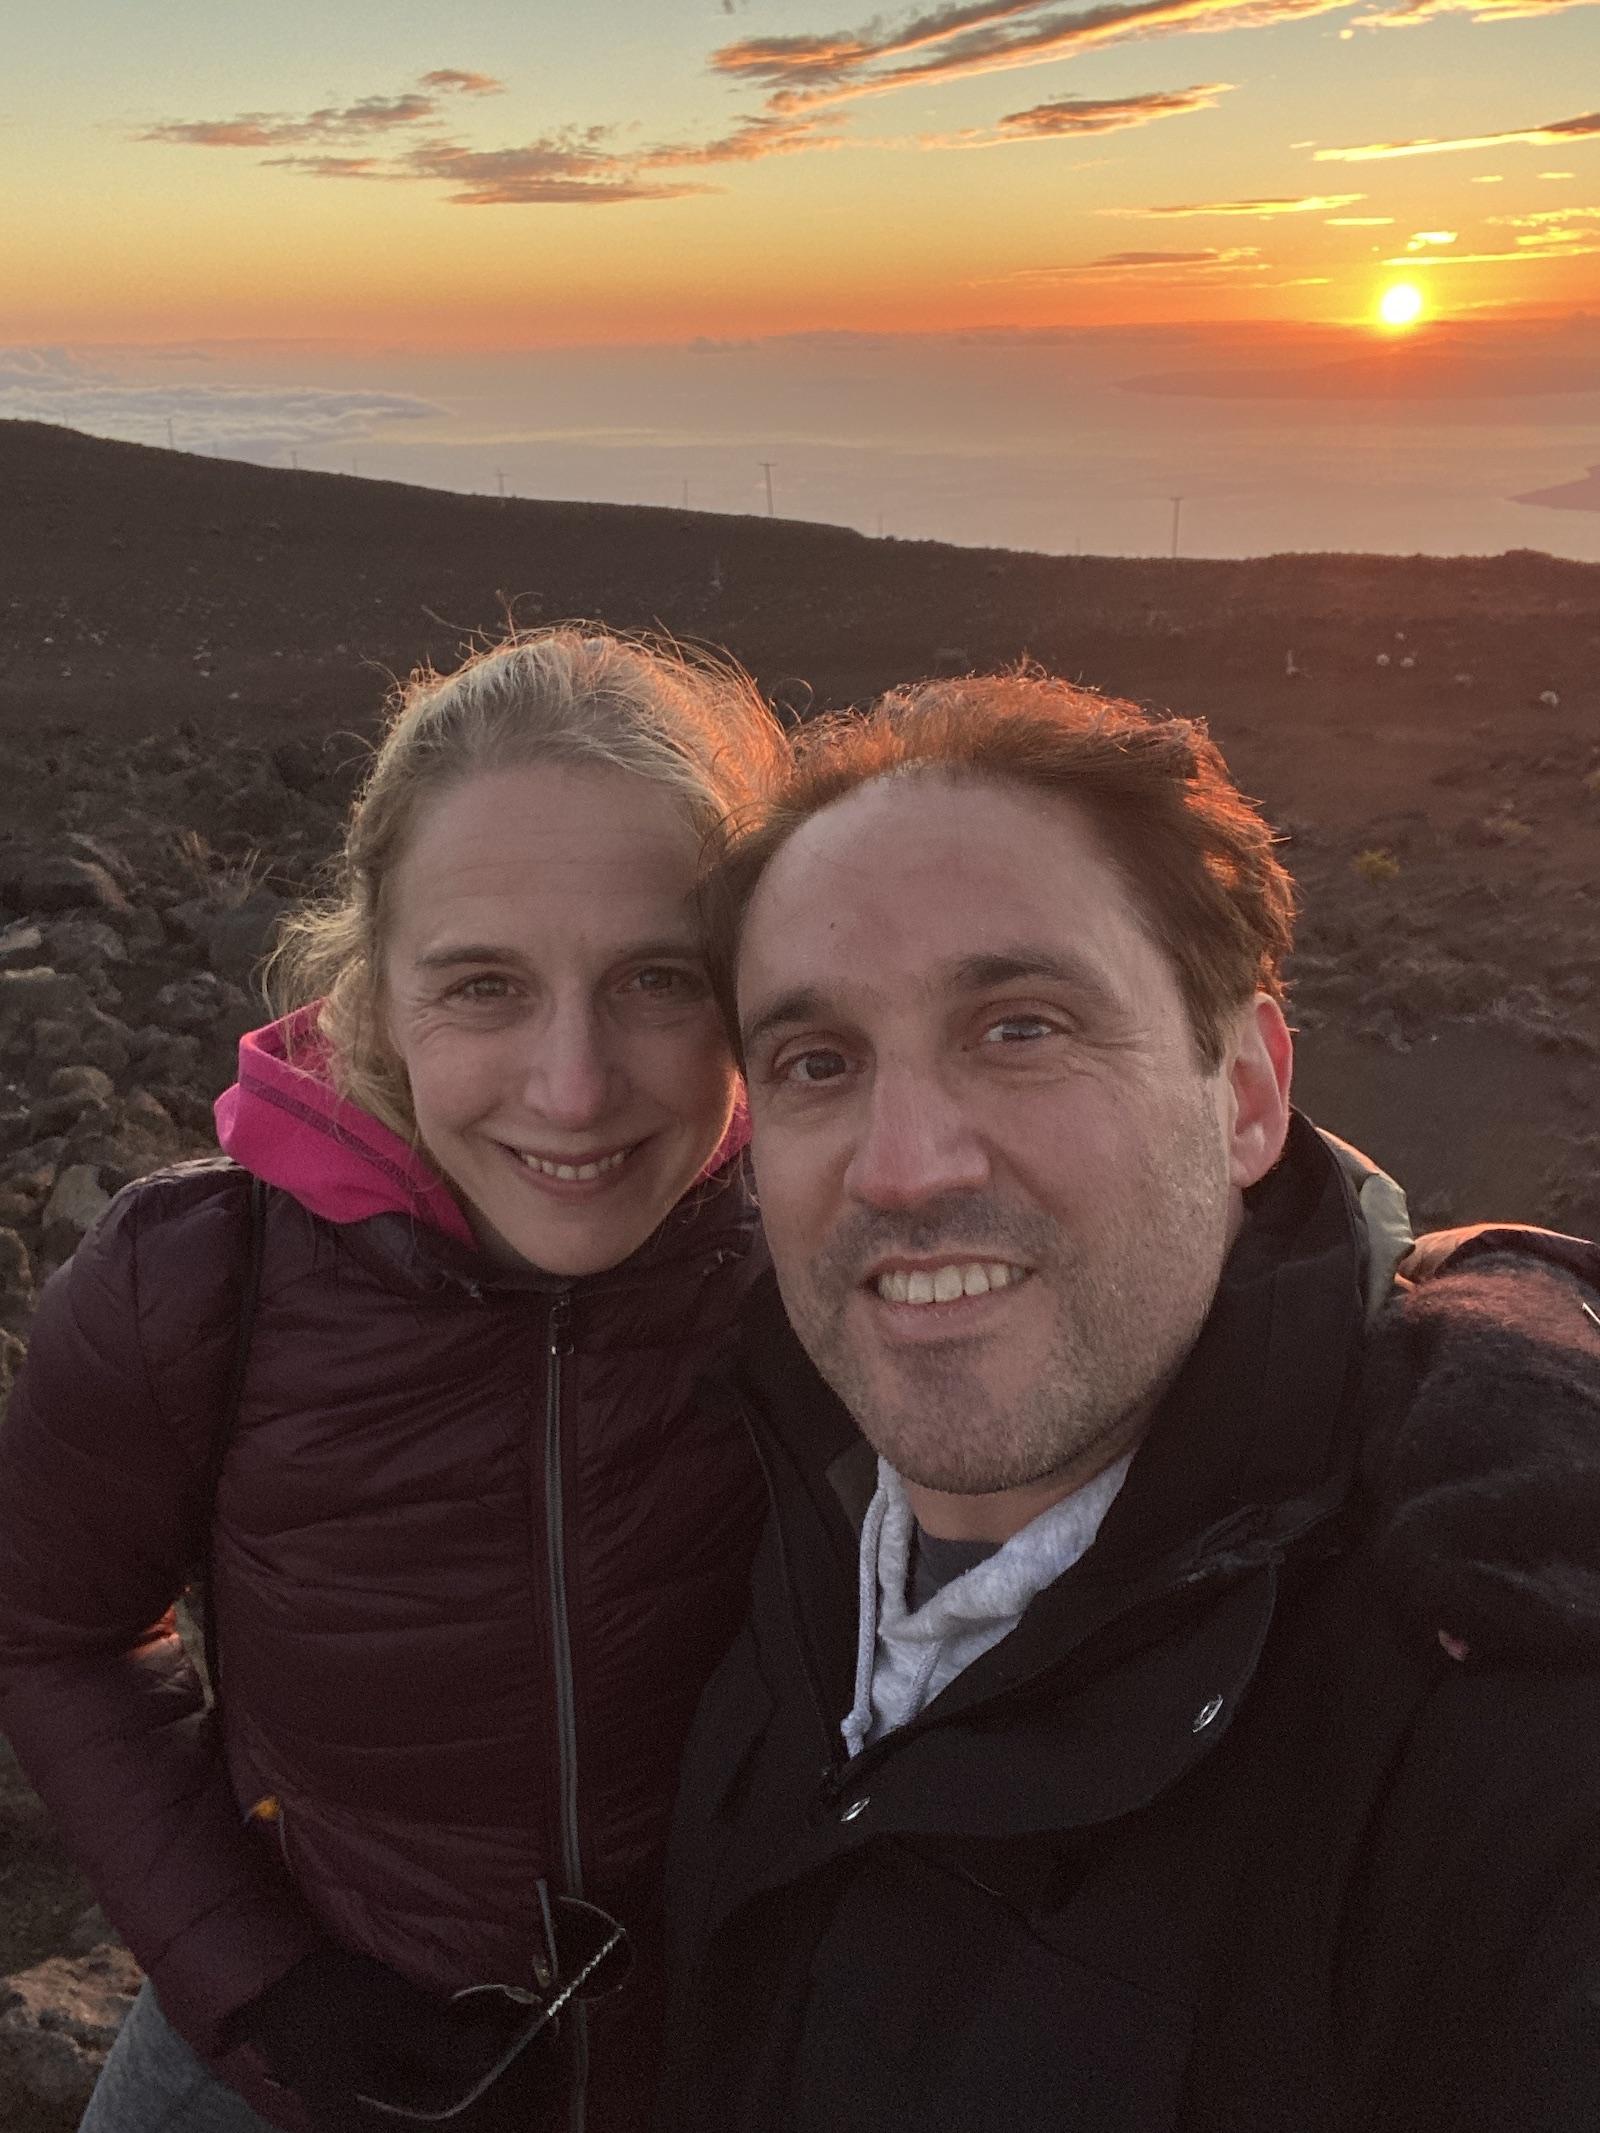 Haleakala view - Sunset